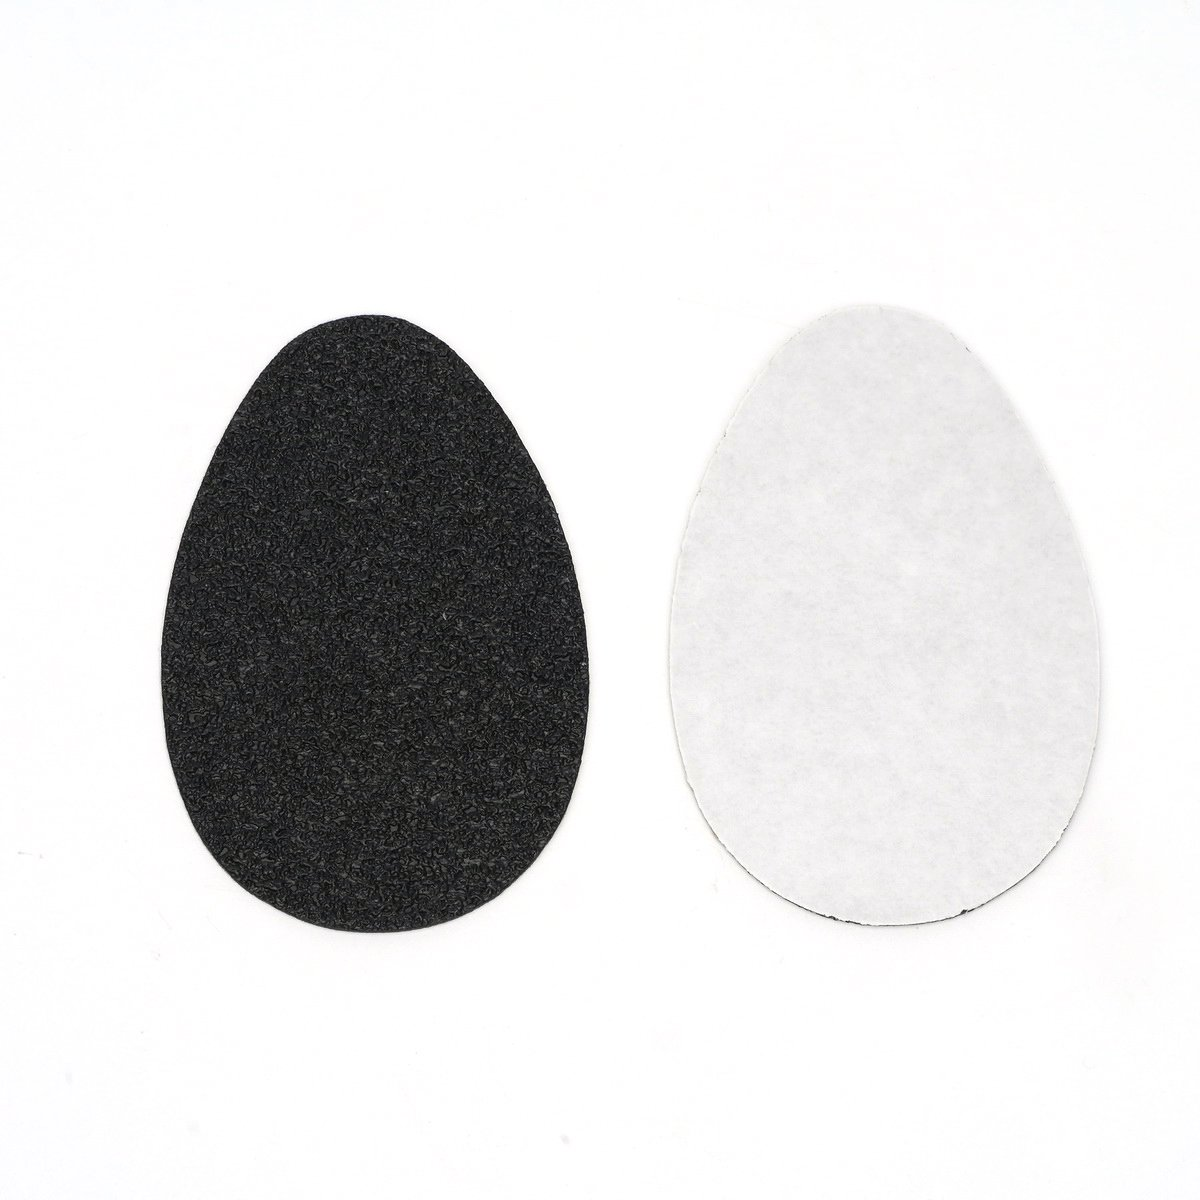 5 Pair Anti Slip Shoe Grip Sole Non-Slip Self-Adhesive Pad Mat Stick Rubber H88 6204165